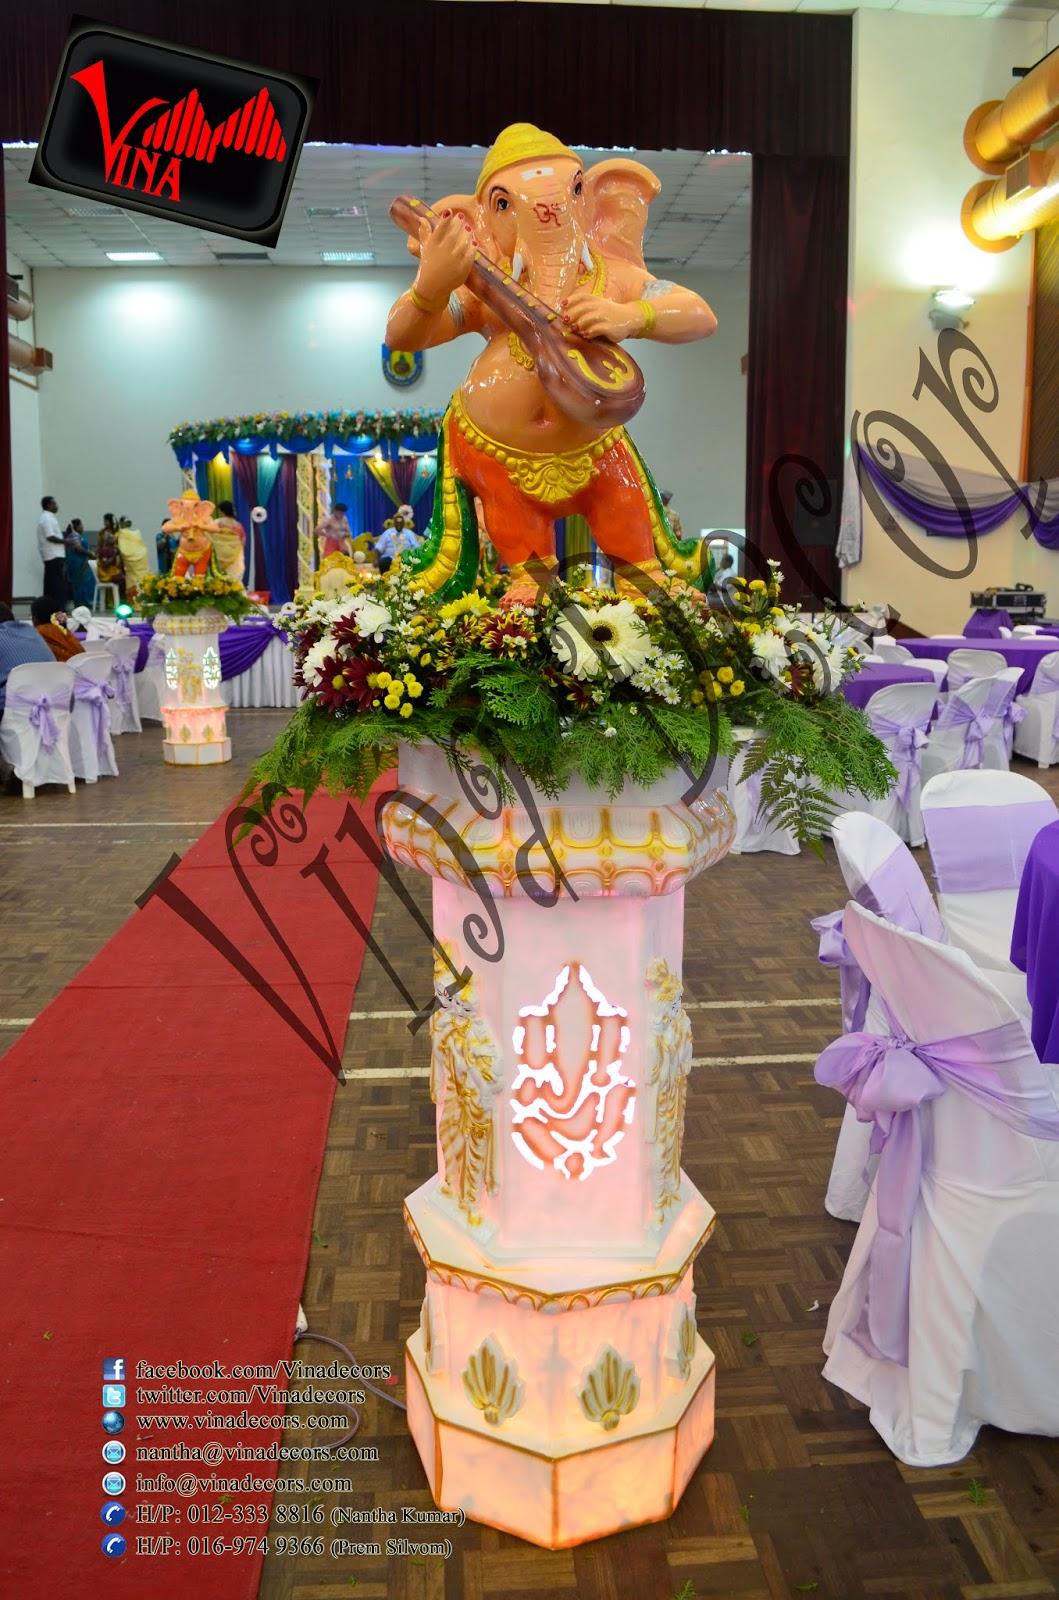 Wedding and Wedding dinner at Dewan Dato Ahmad Razali, Kampung Melayu Ampang, 68000 Ampang, Selangor, Malaysia (Ampang Hall) (Setup for Ganesha Flower pillar, Red Carpet, Stage Scallop and Backdrop with lighting, Manavarai, Crystal Dome Arch chair (cover & ribbon) and Table (cloth).